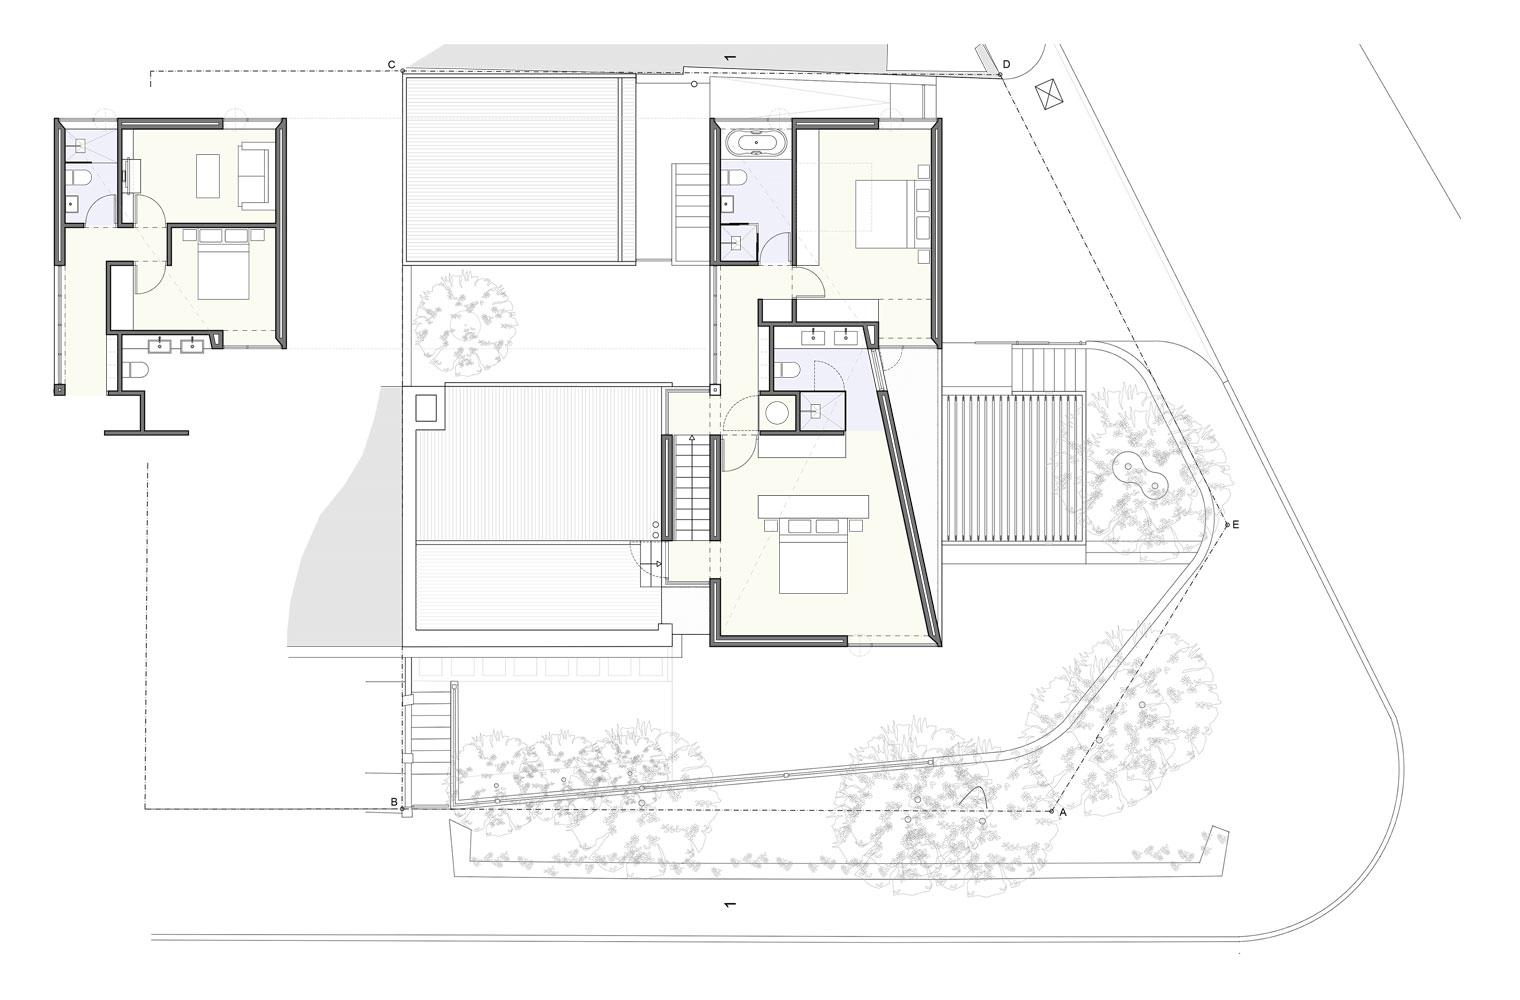 27 Clovelly Avenue - 1st Floor Plan